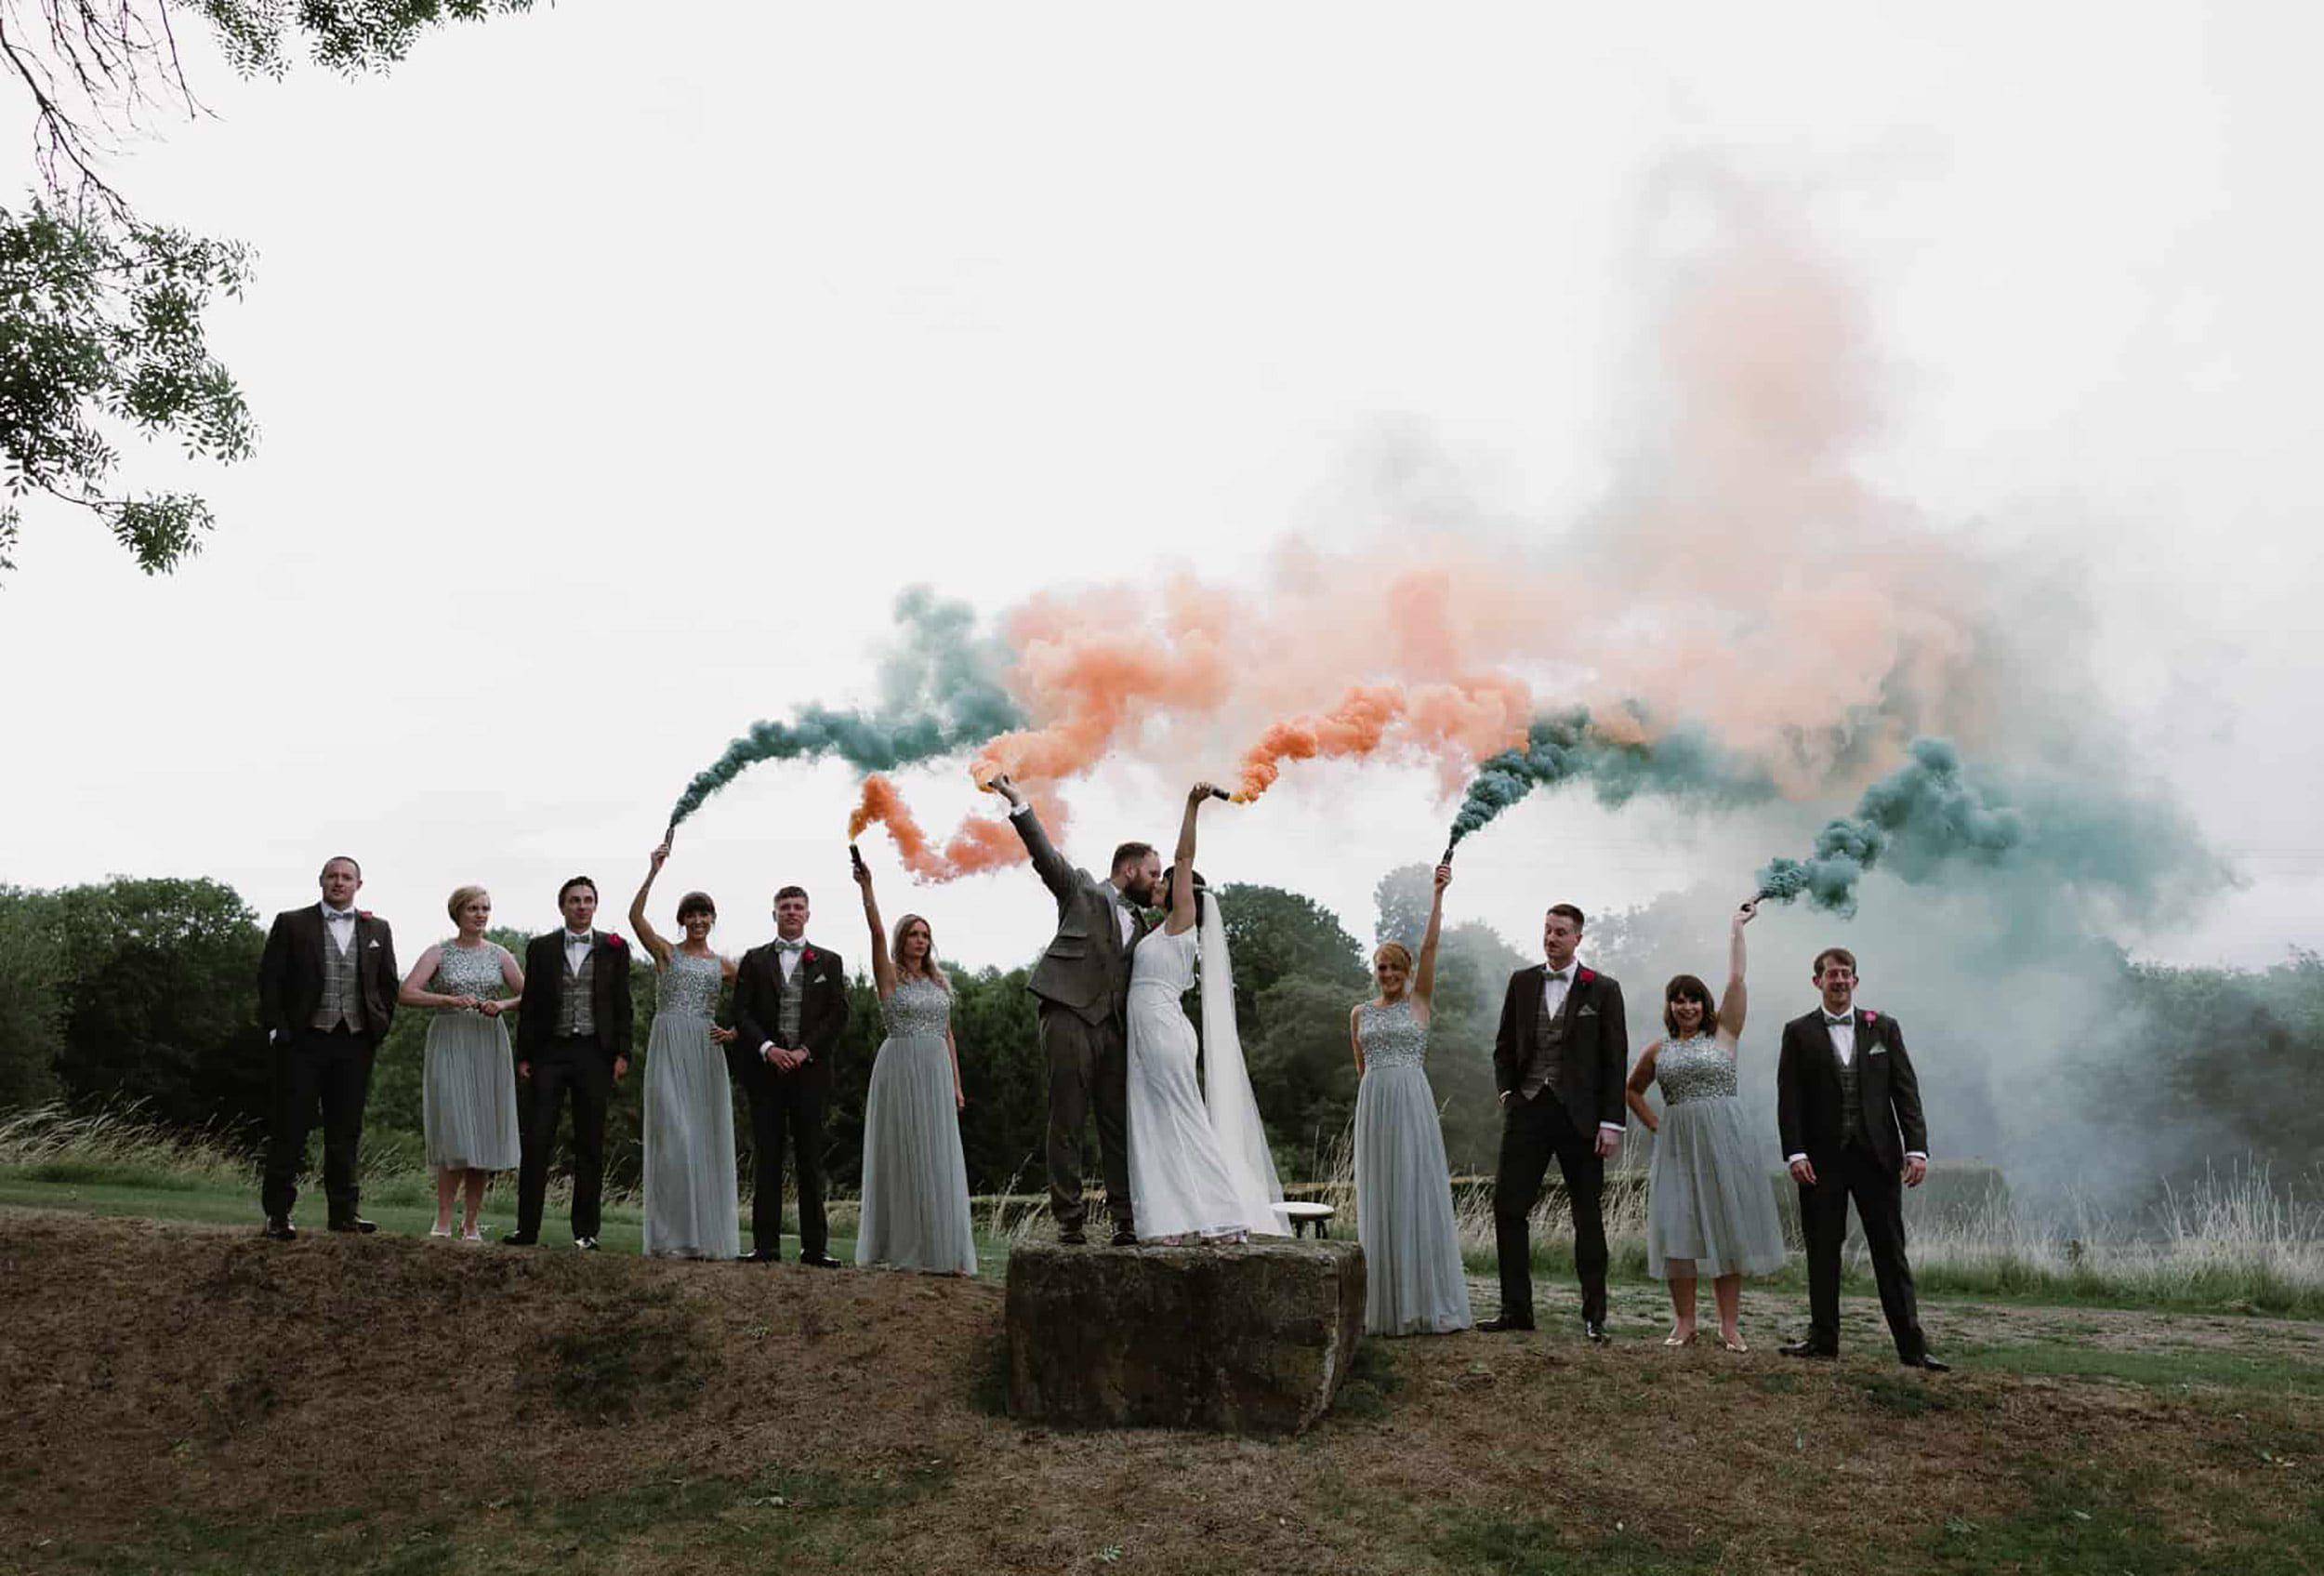 Smoke bomb wedding photography at Tower Hill Barns by Damian Brandon photography